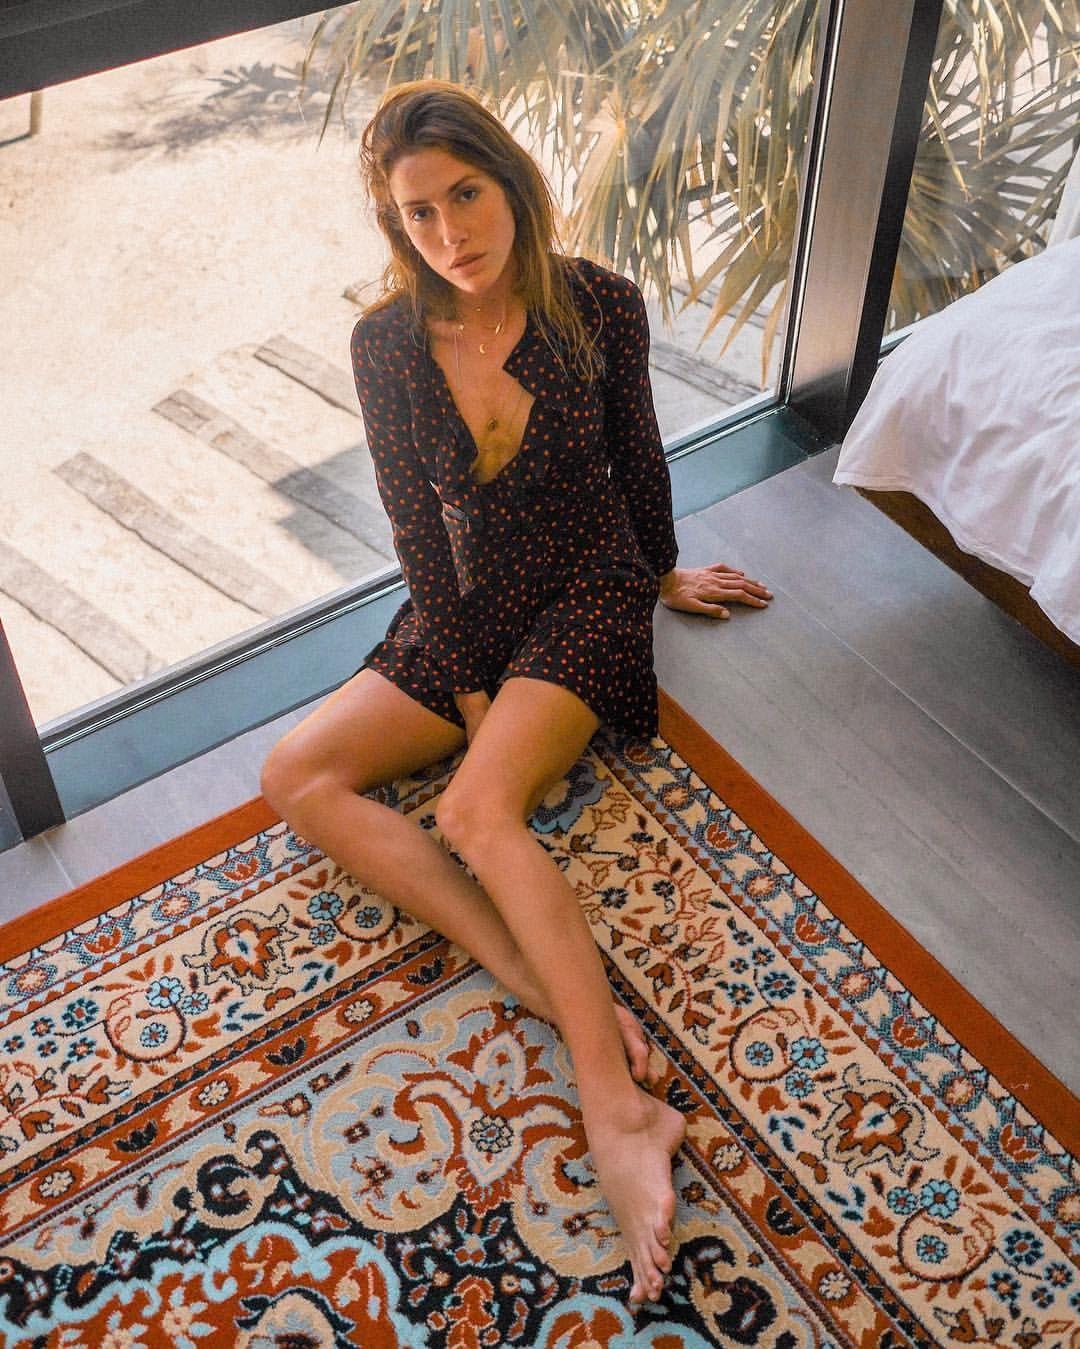 Feet Jelena Cikoja nudes (56 photos), Topless, Hot, Selfie, braless 2006